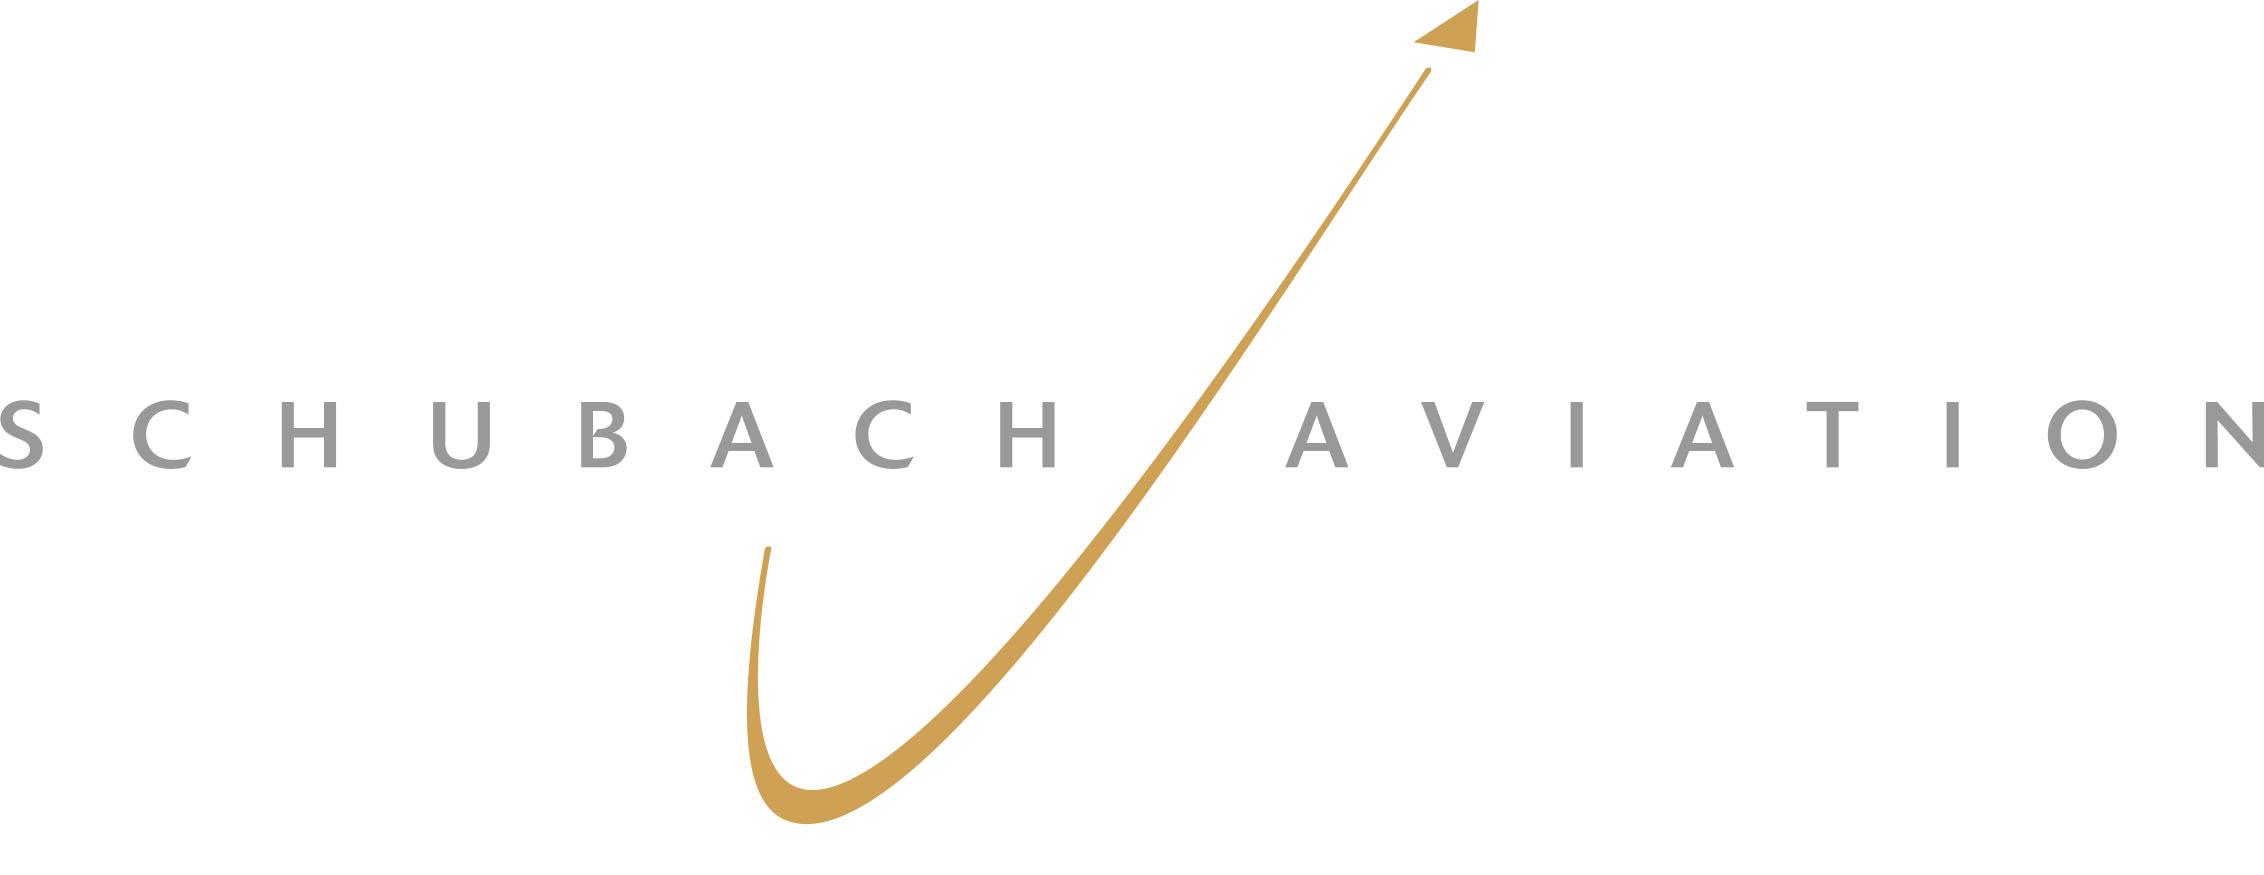 Schubach-logo-Gold-Gray.jpg